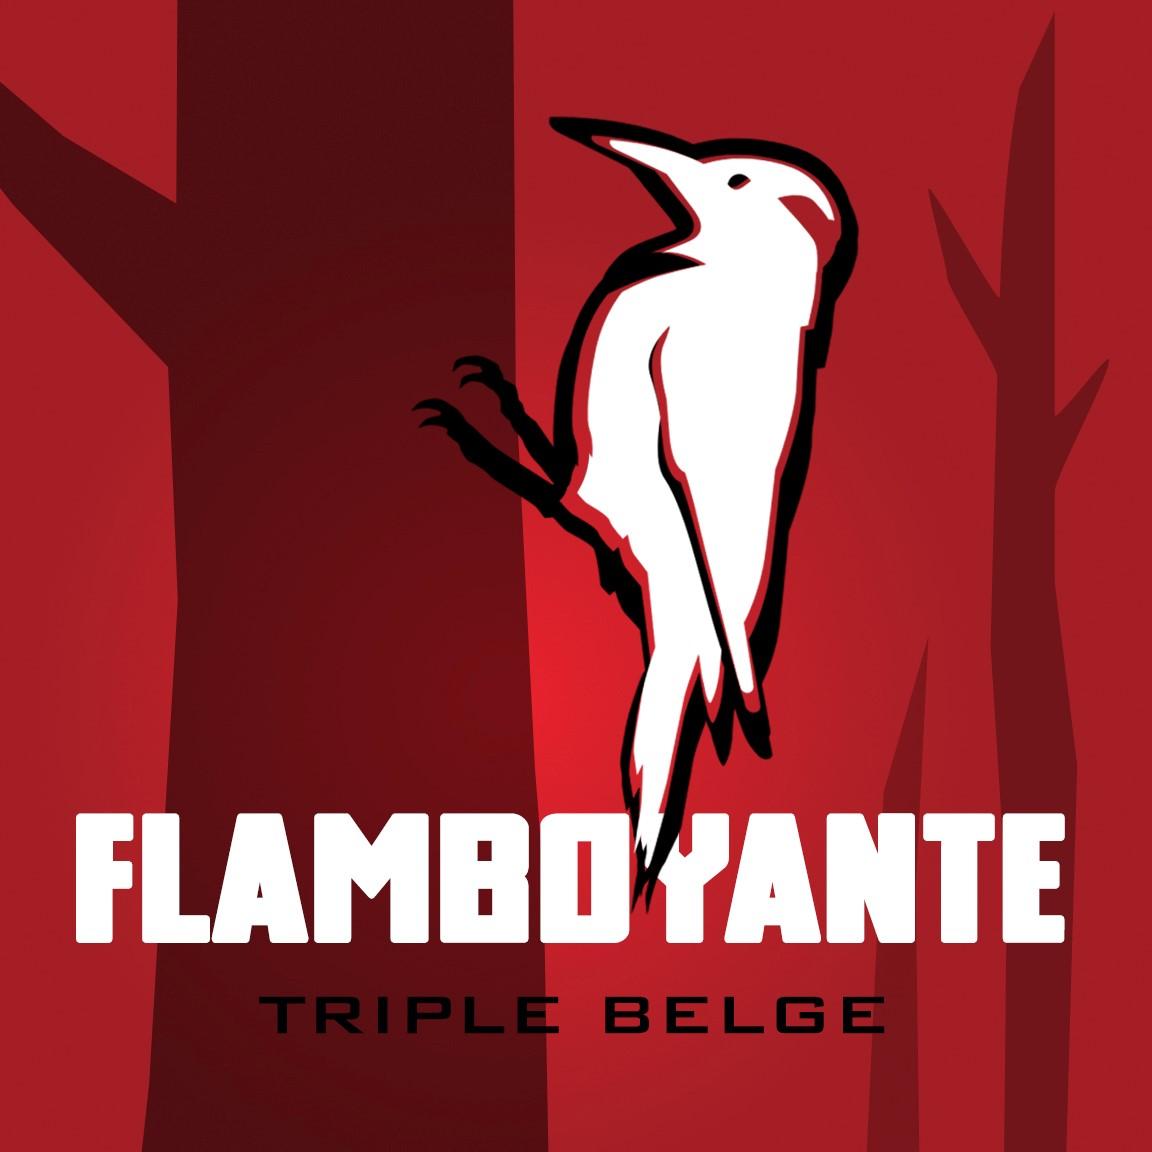 Flamboyante - 500ml